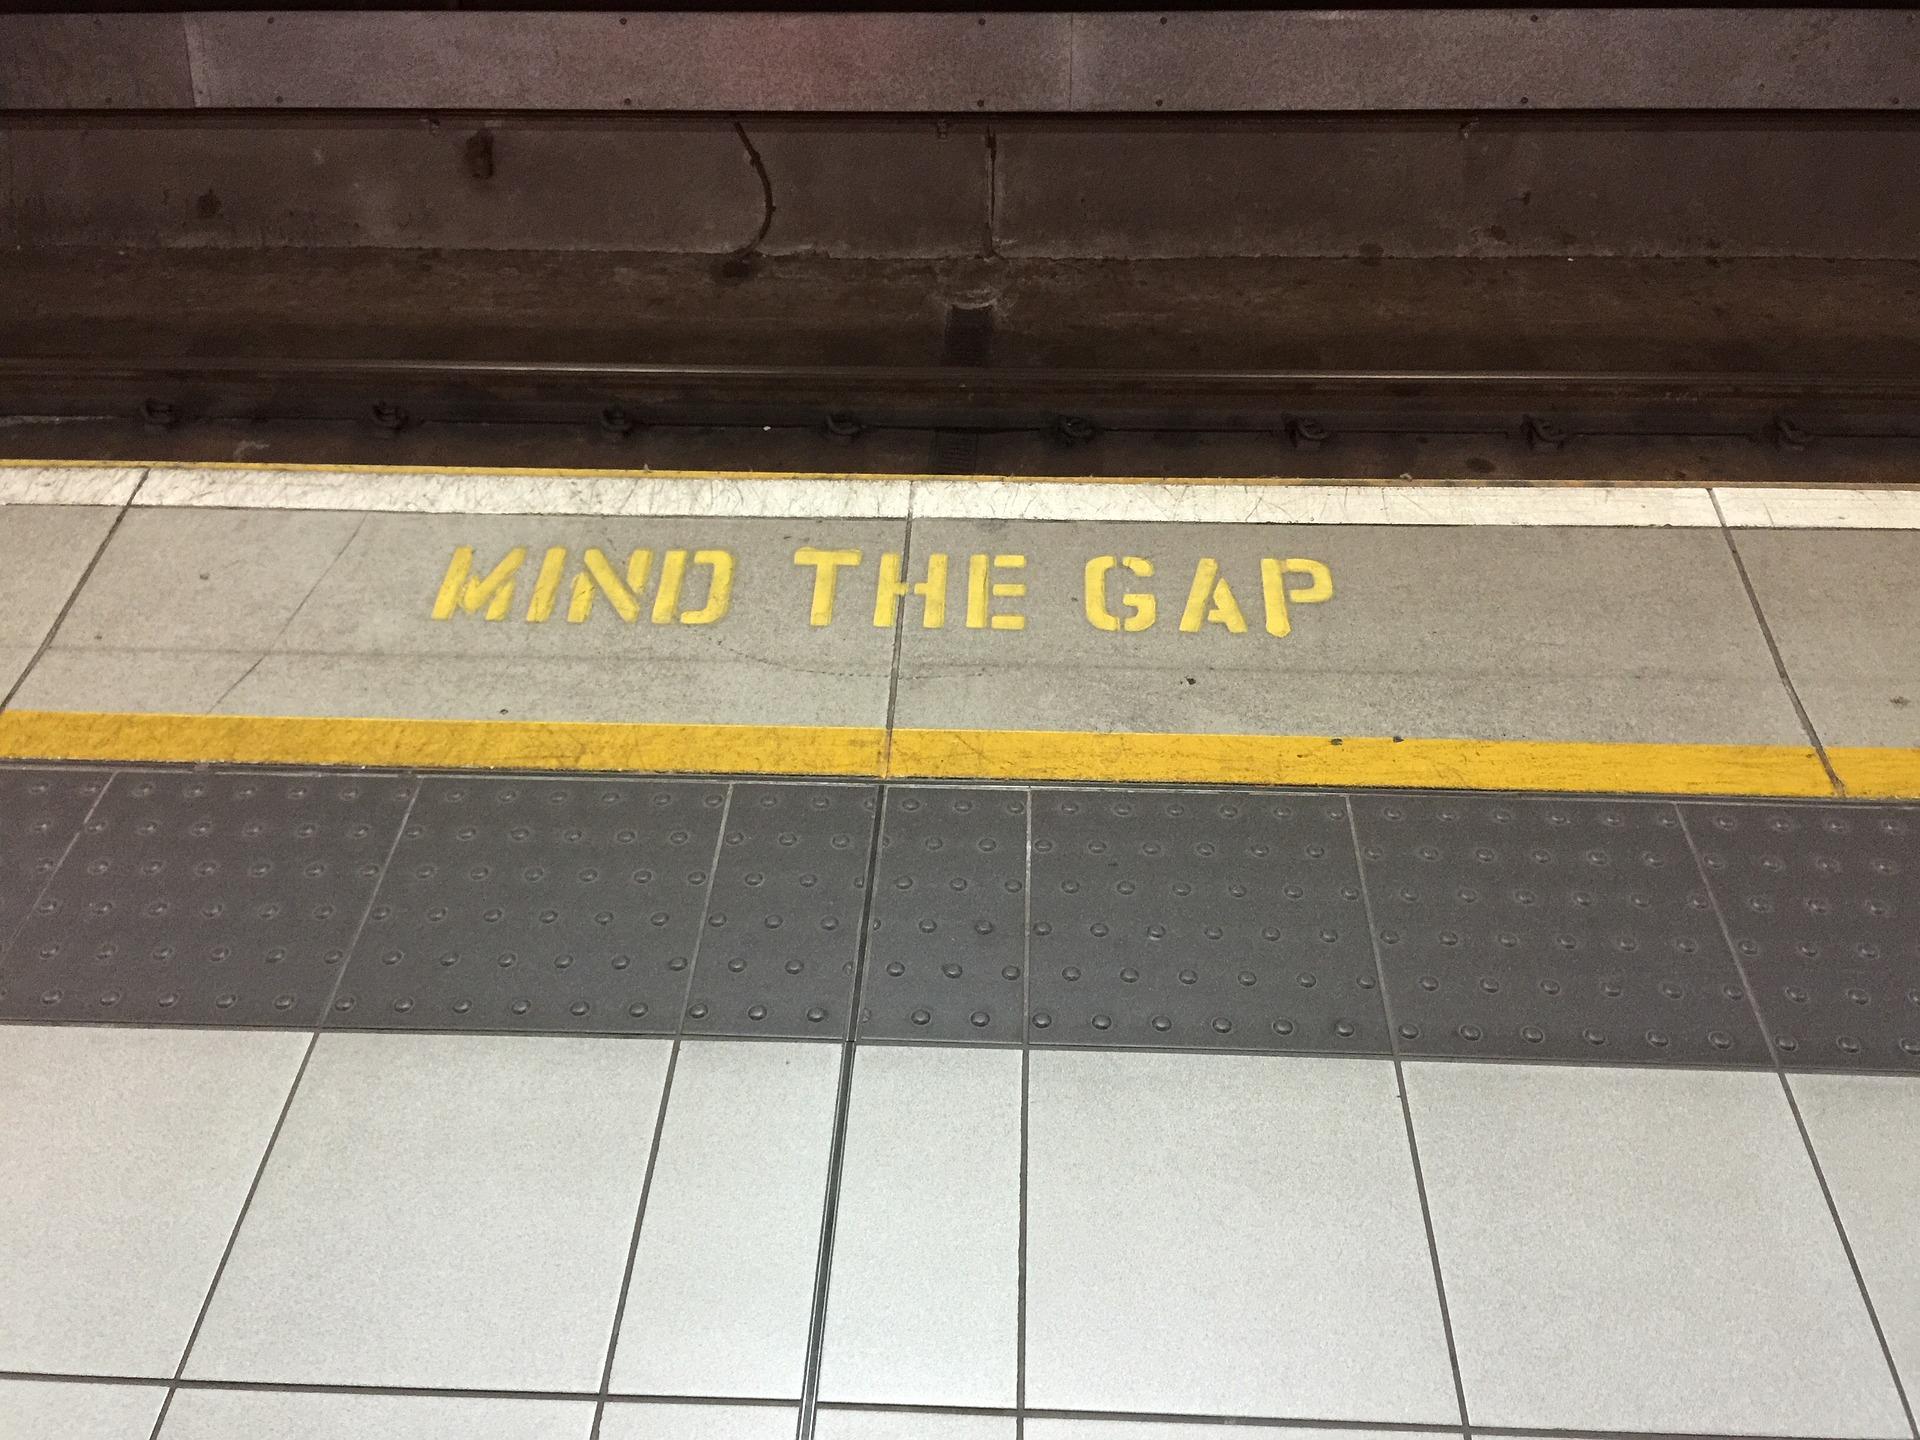 mind-the-gap-882368_1920.jpg